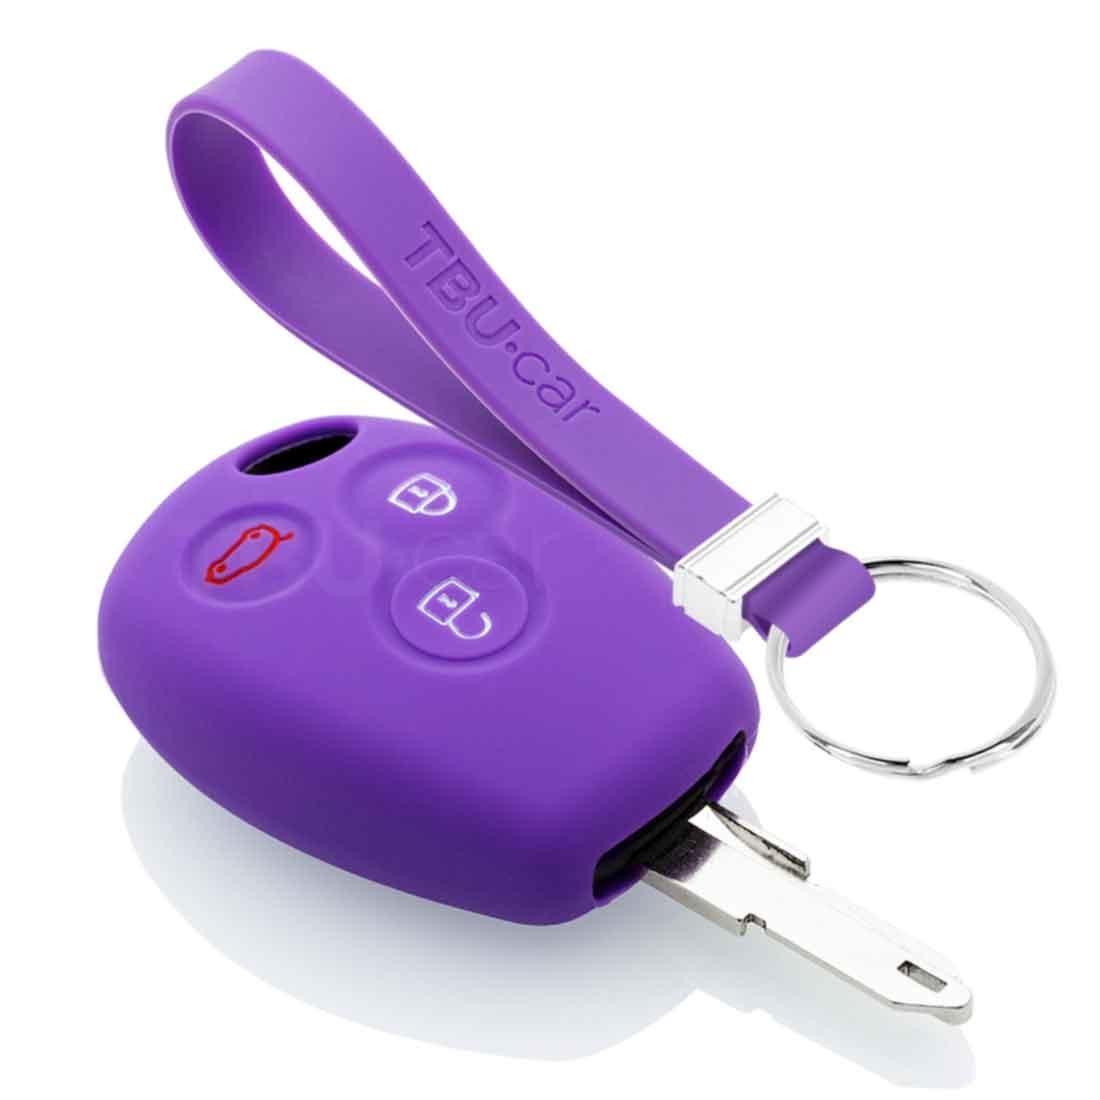 TBU car TBU car Autoschlüssel Hülle kompatibel mit Dacia 3 Tasten - Schutzhülle aus Silikon - Auto Schlüsselhülle Cover in Violett